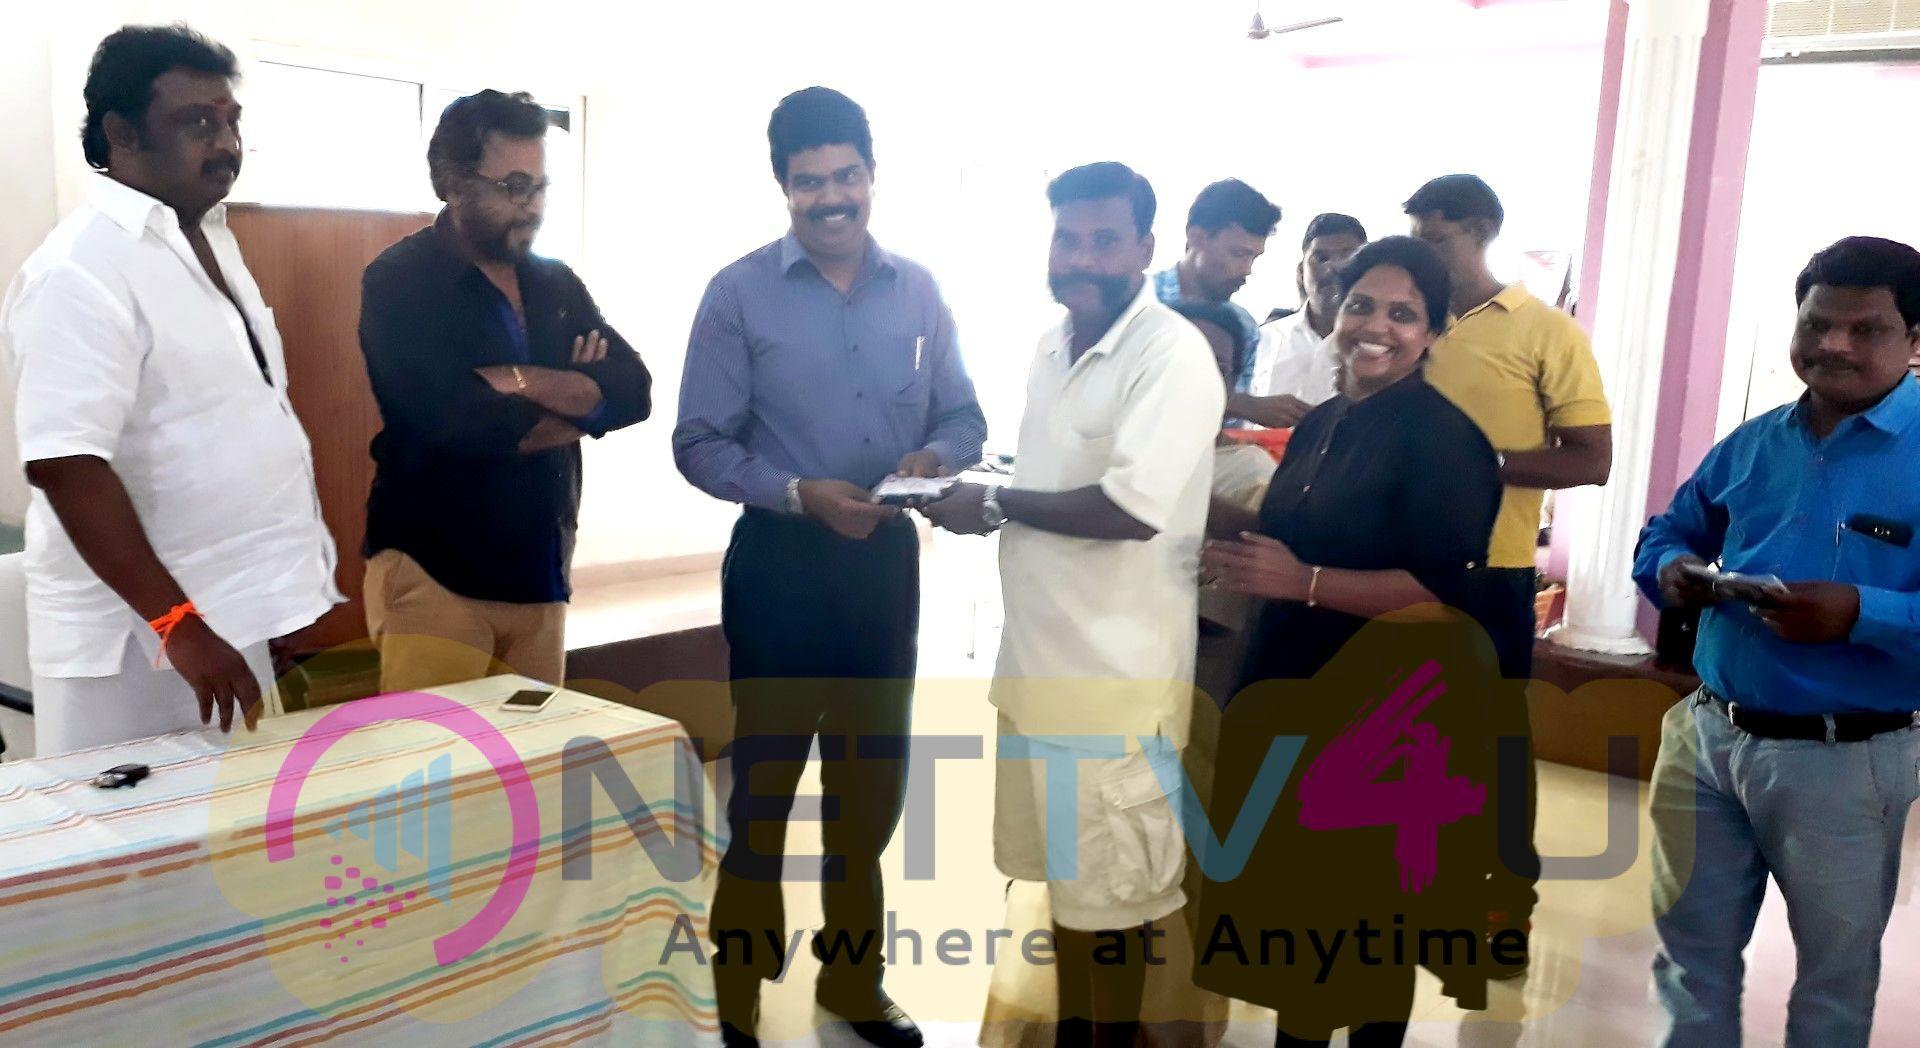 Dr.Vijay Shankar Son Of The Late Actor Jaishankar Conducted A Free Eye Screening Camp Pics